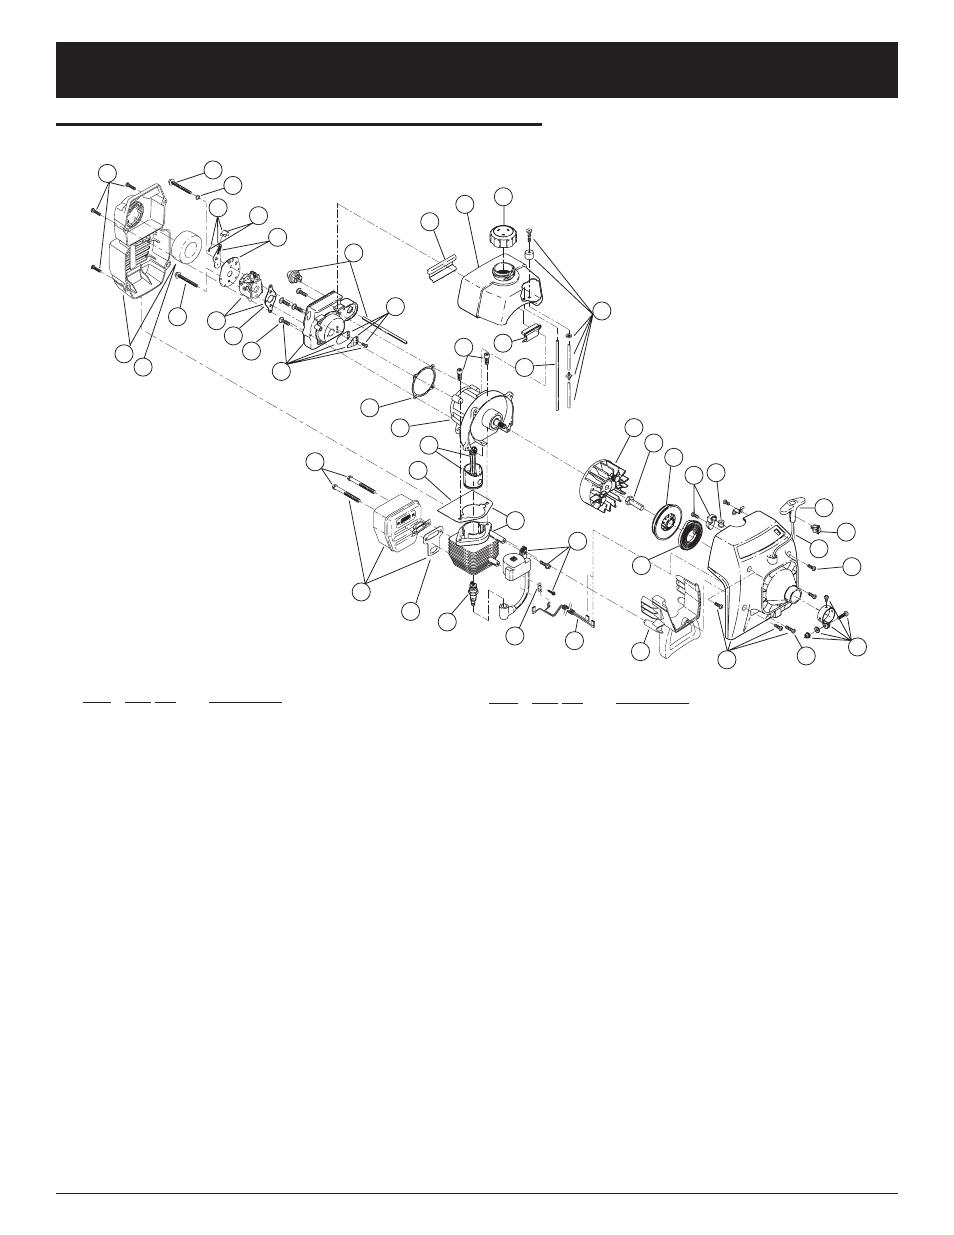 medium resolution of parts list engine parts ryobi 700r 2 cycle gas trimmer ryobi 700r